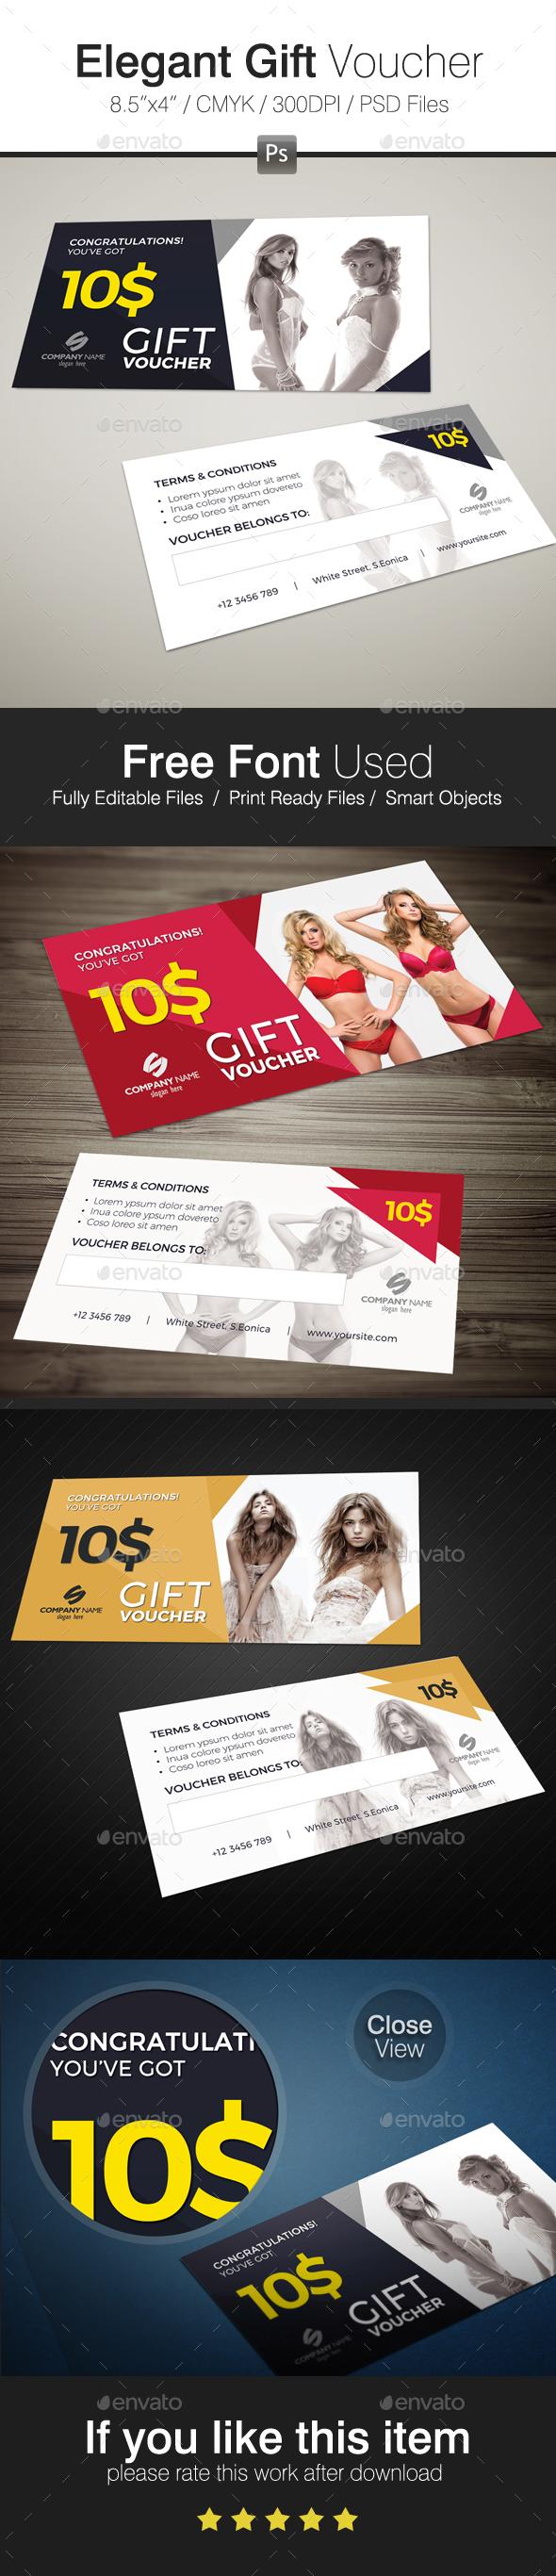 Elegant Gift Voucher - Cards & Invites Print Templates